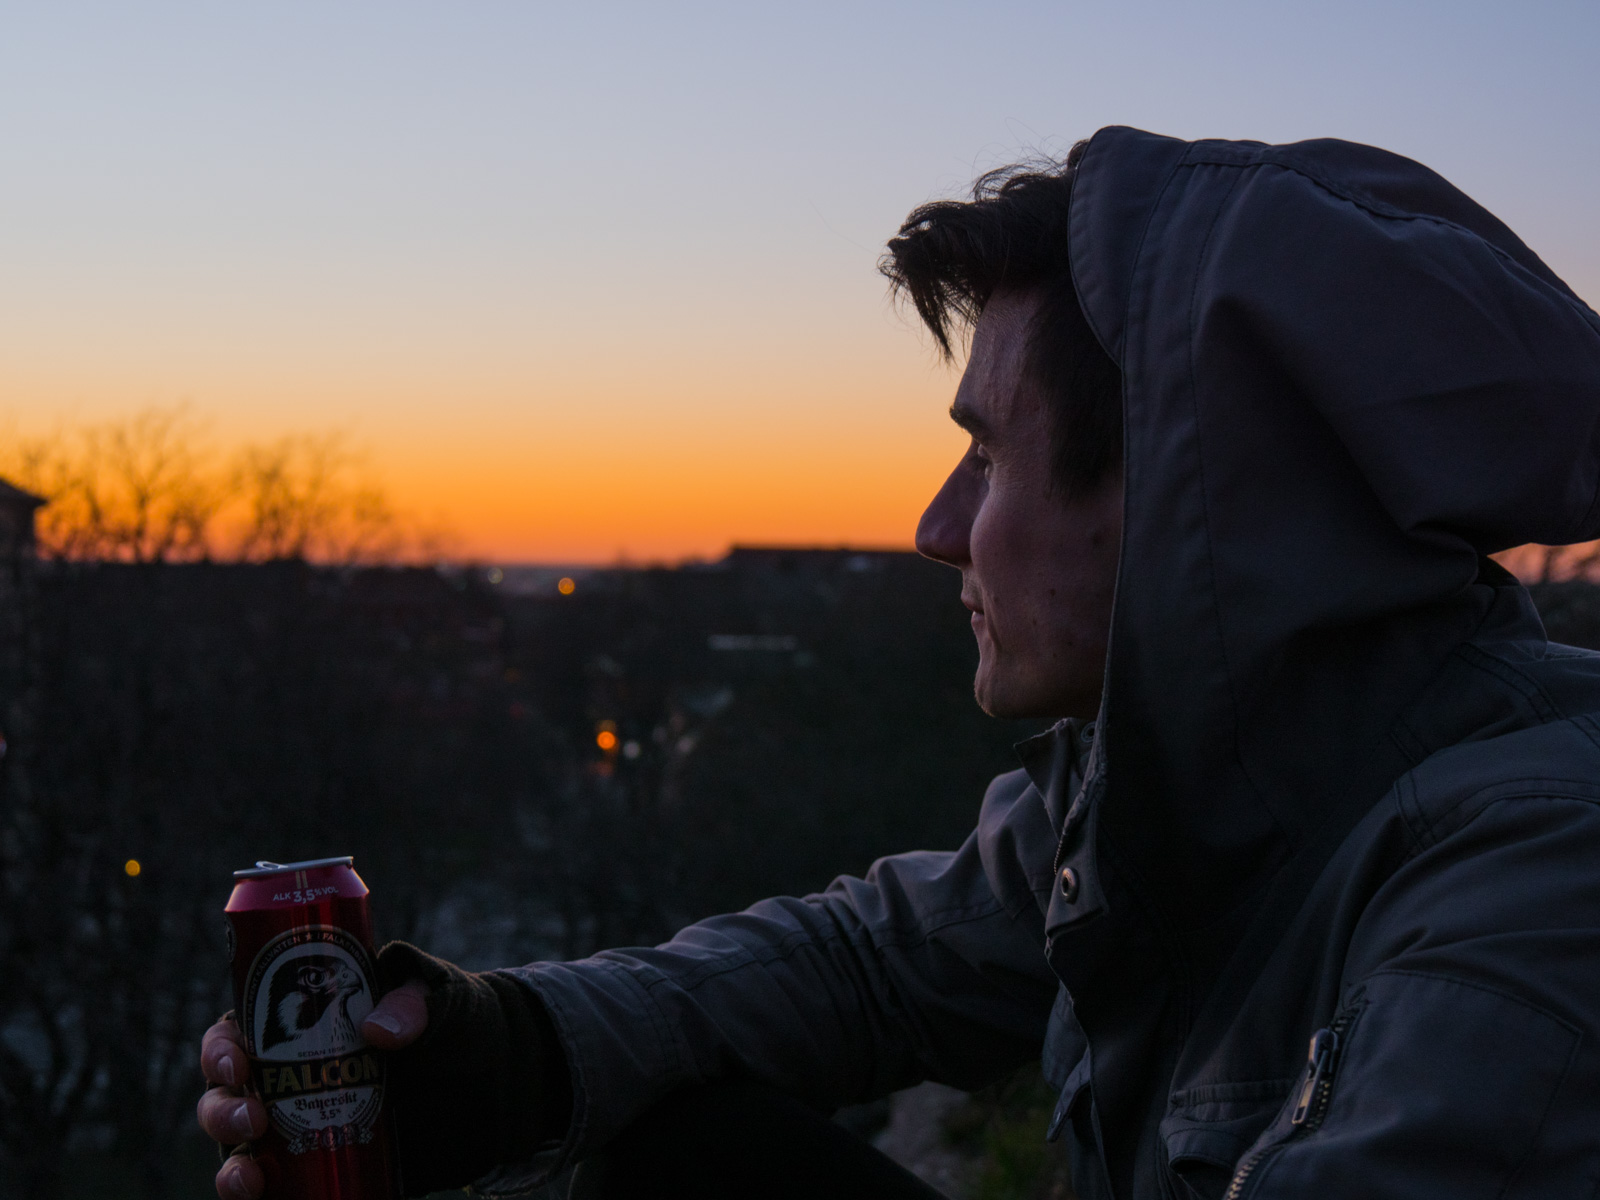 Erik in the sunset again